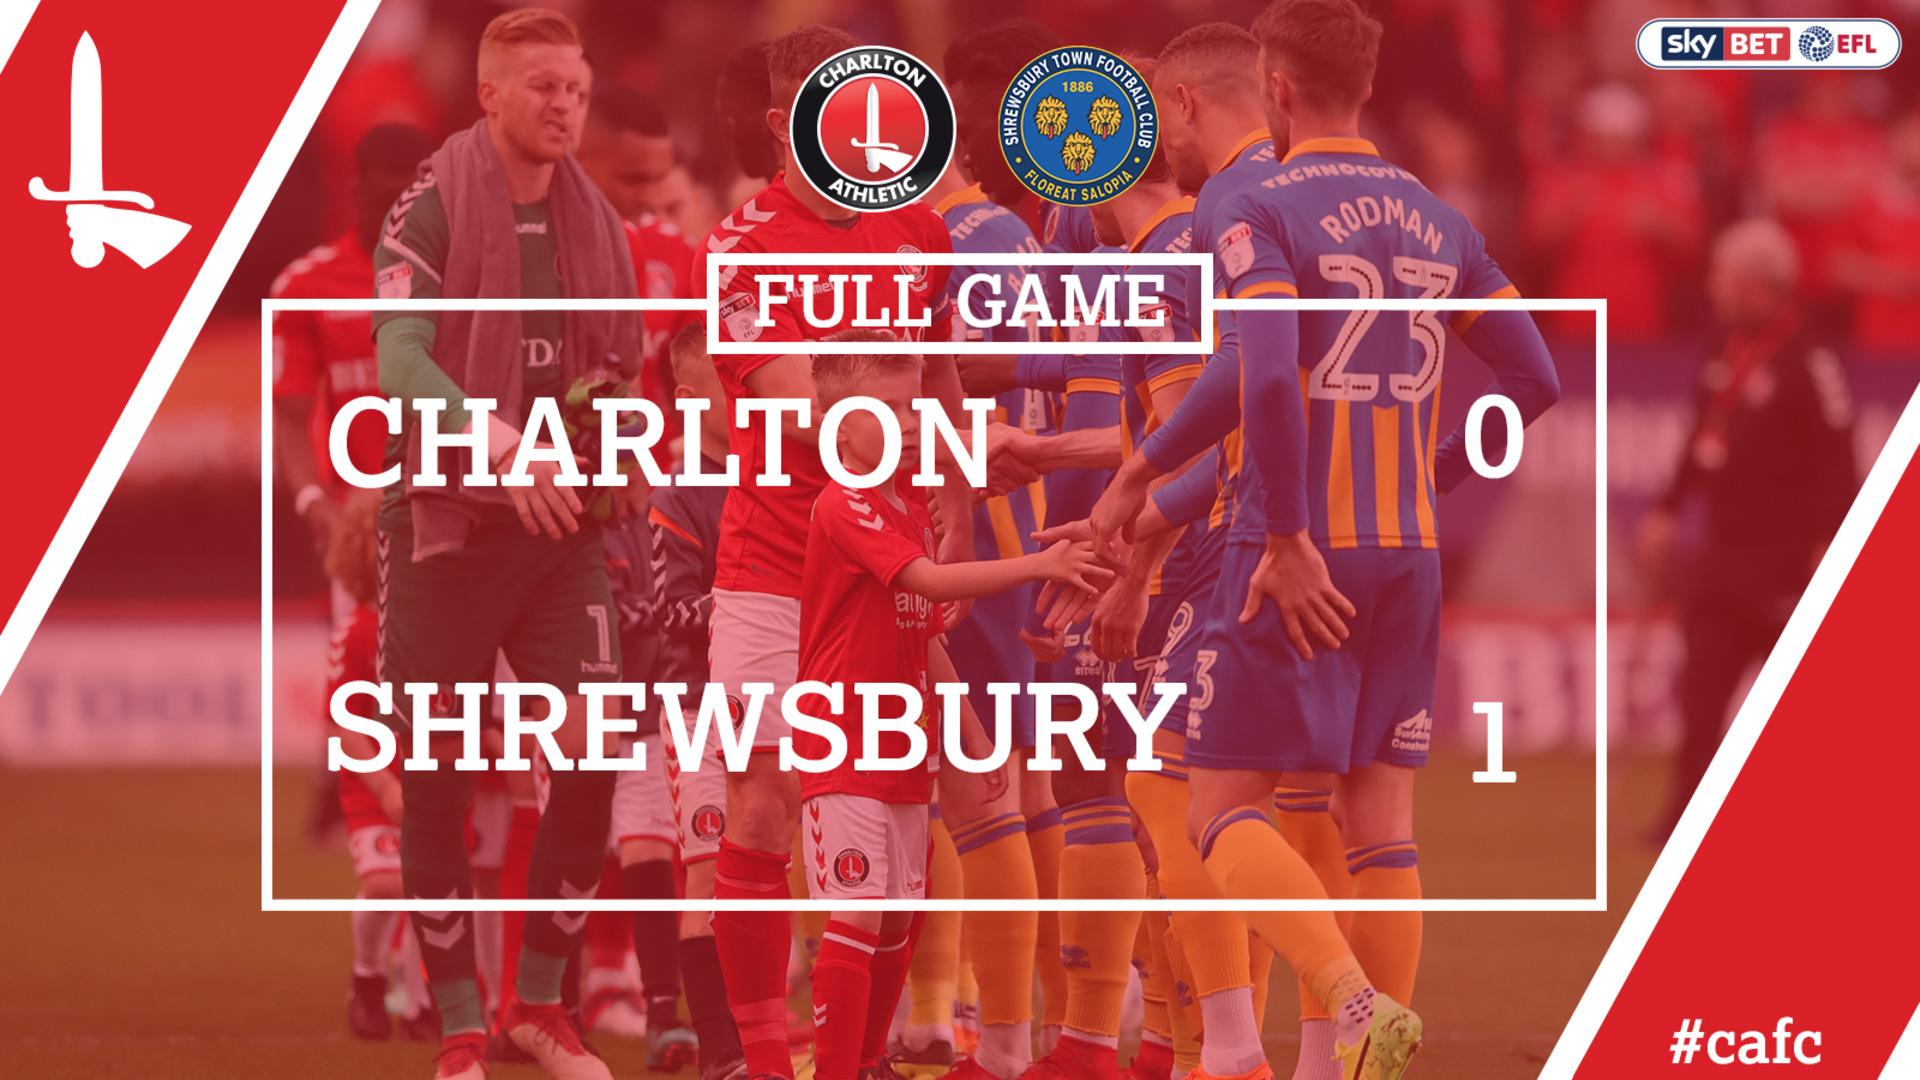 FULL GAME | Charlton 0 Shrewsbury 1 (May 2018)